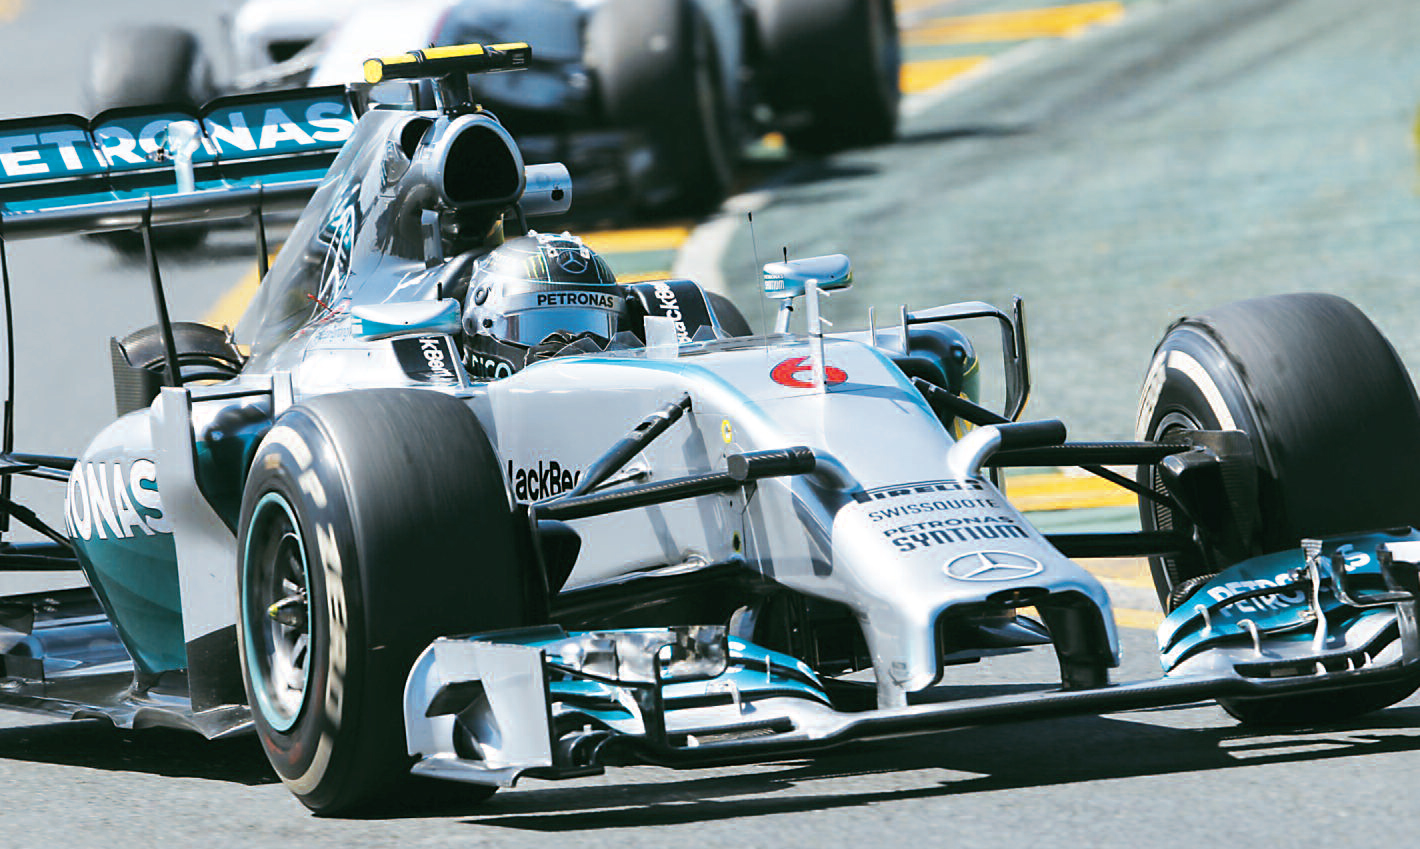 Taller actual los motores de formula 1 mercedes benz 1 for Mercedes benz formula 1